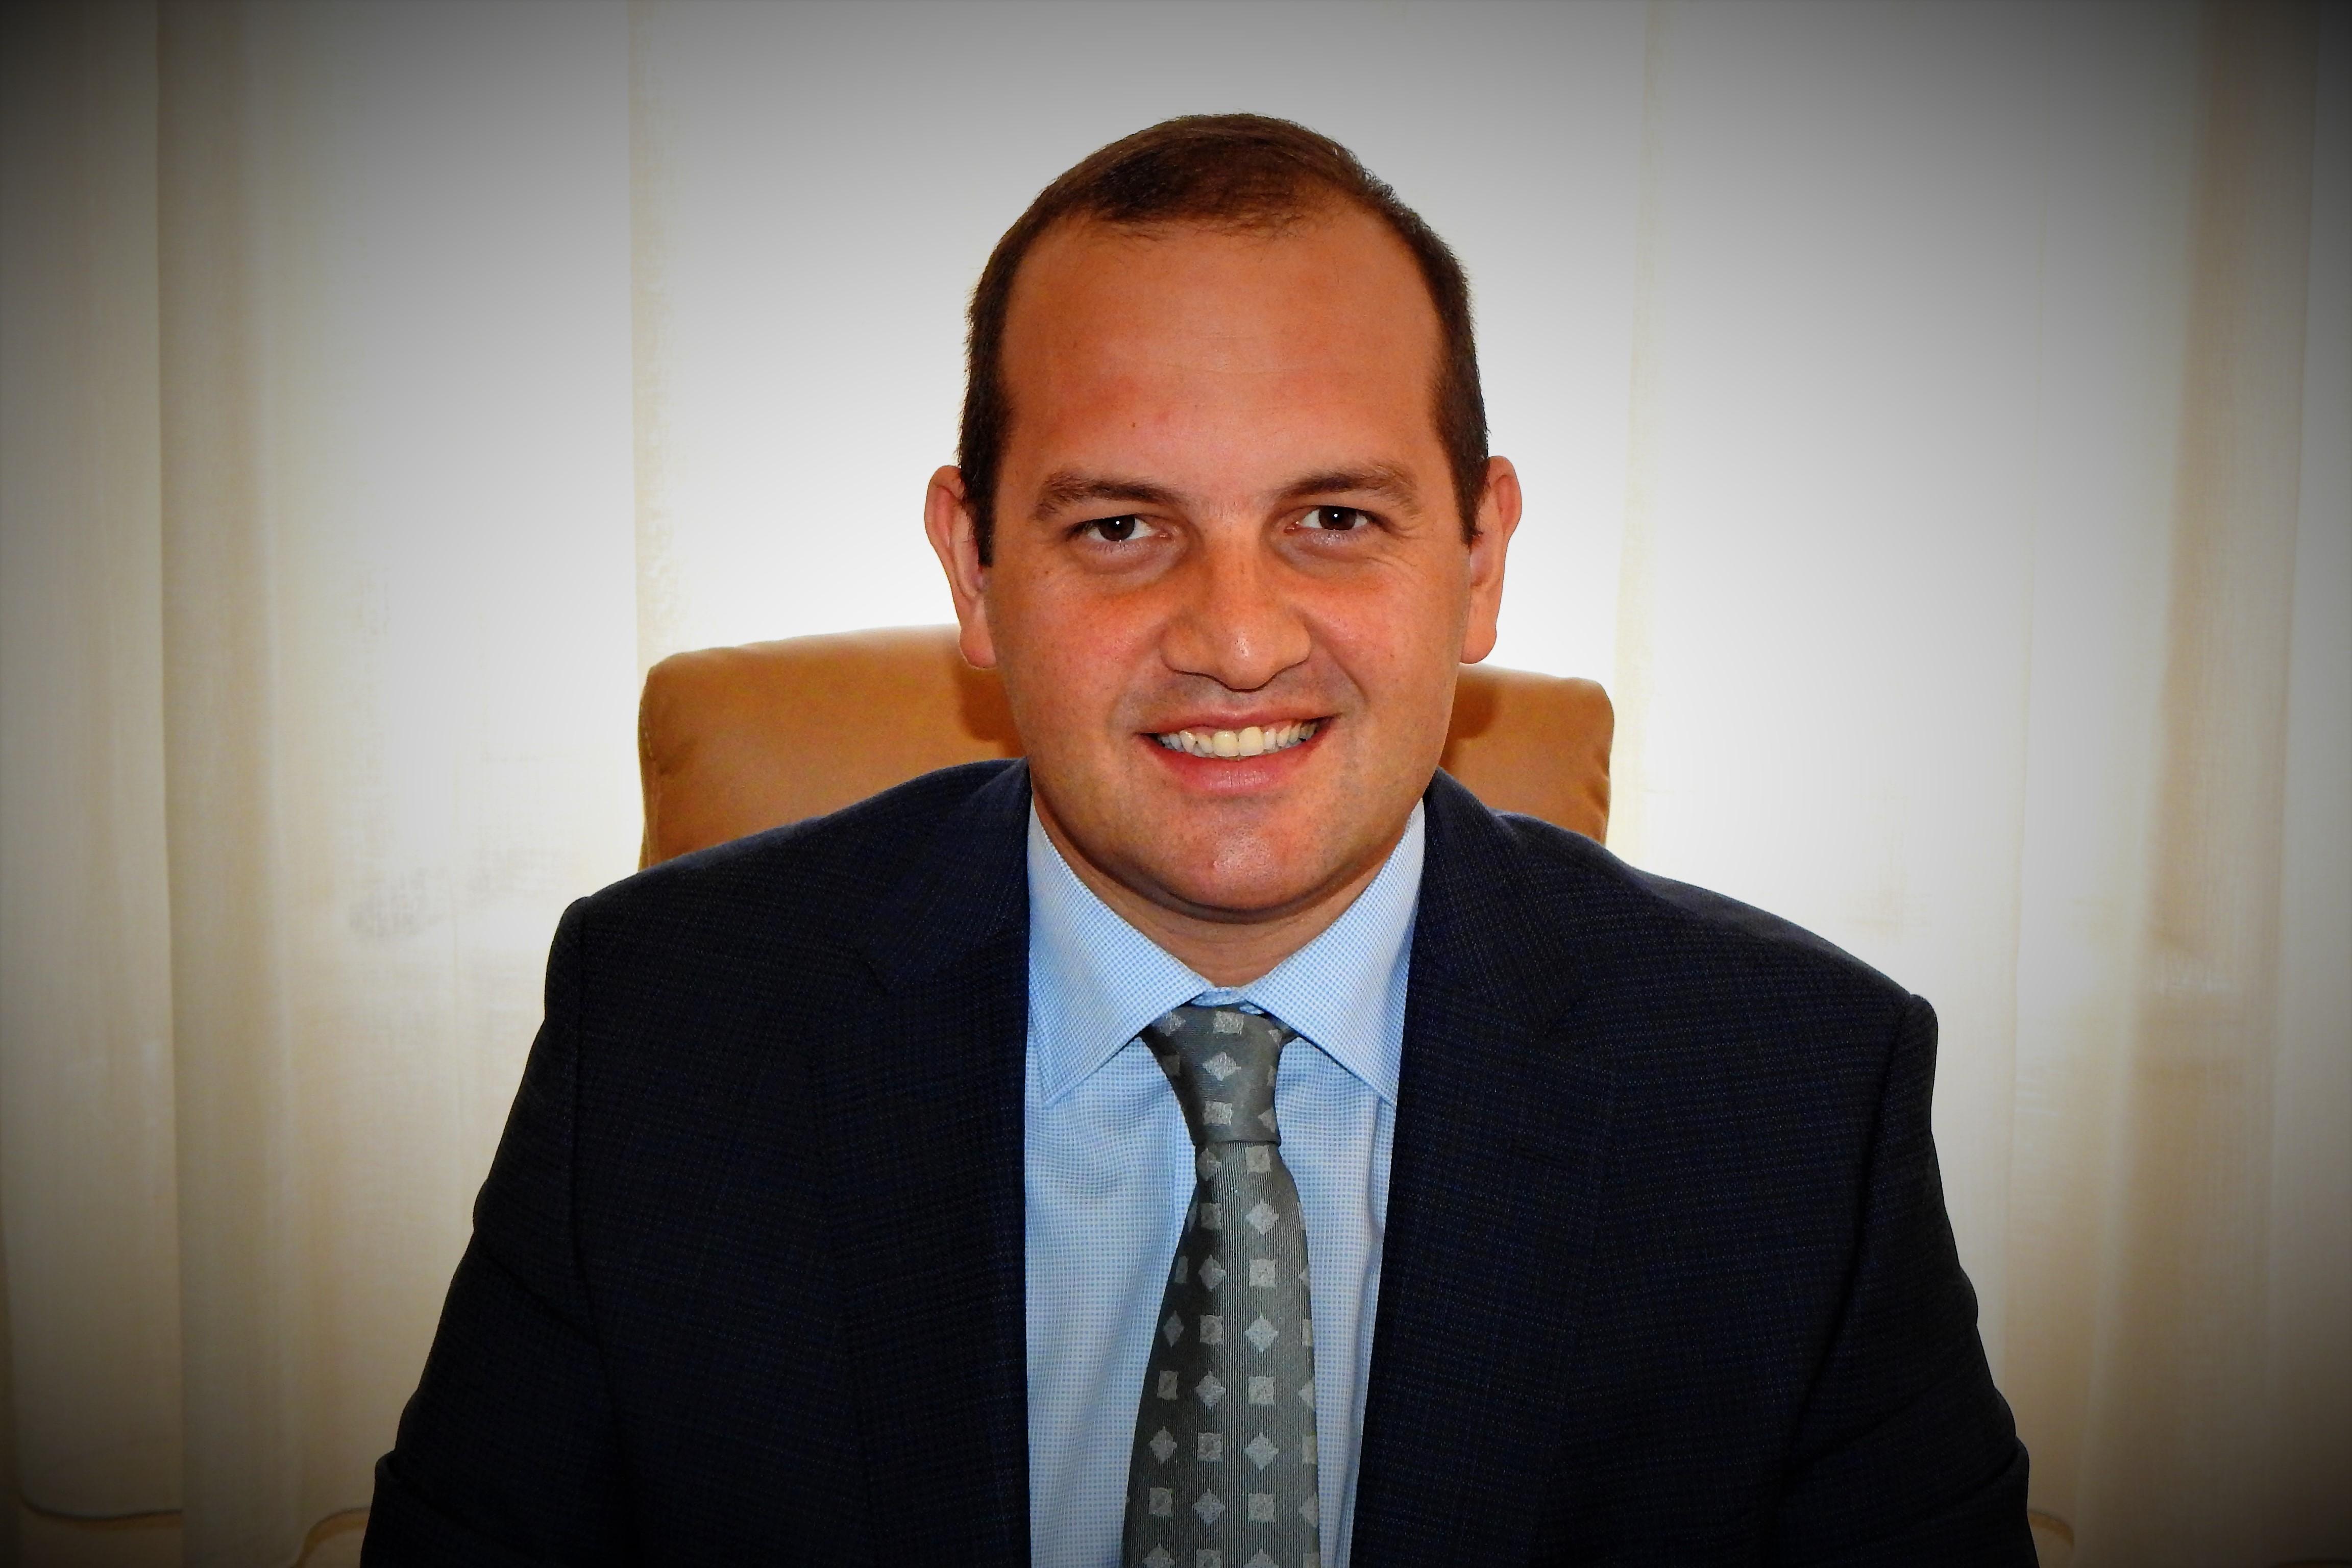 Ivan Klarin o izmjenama Zakona o financiranju lokalne samouprave: Ministar Zdravko Marić potiče iseljavanje s otoka